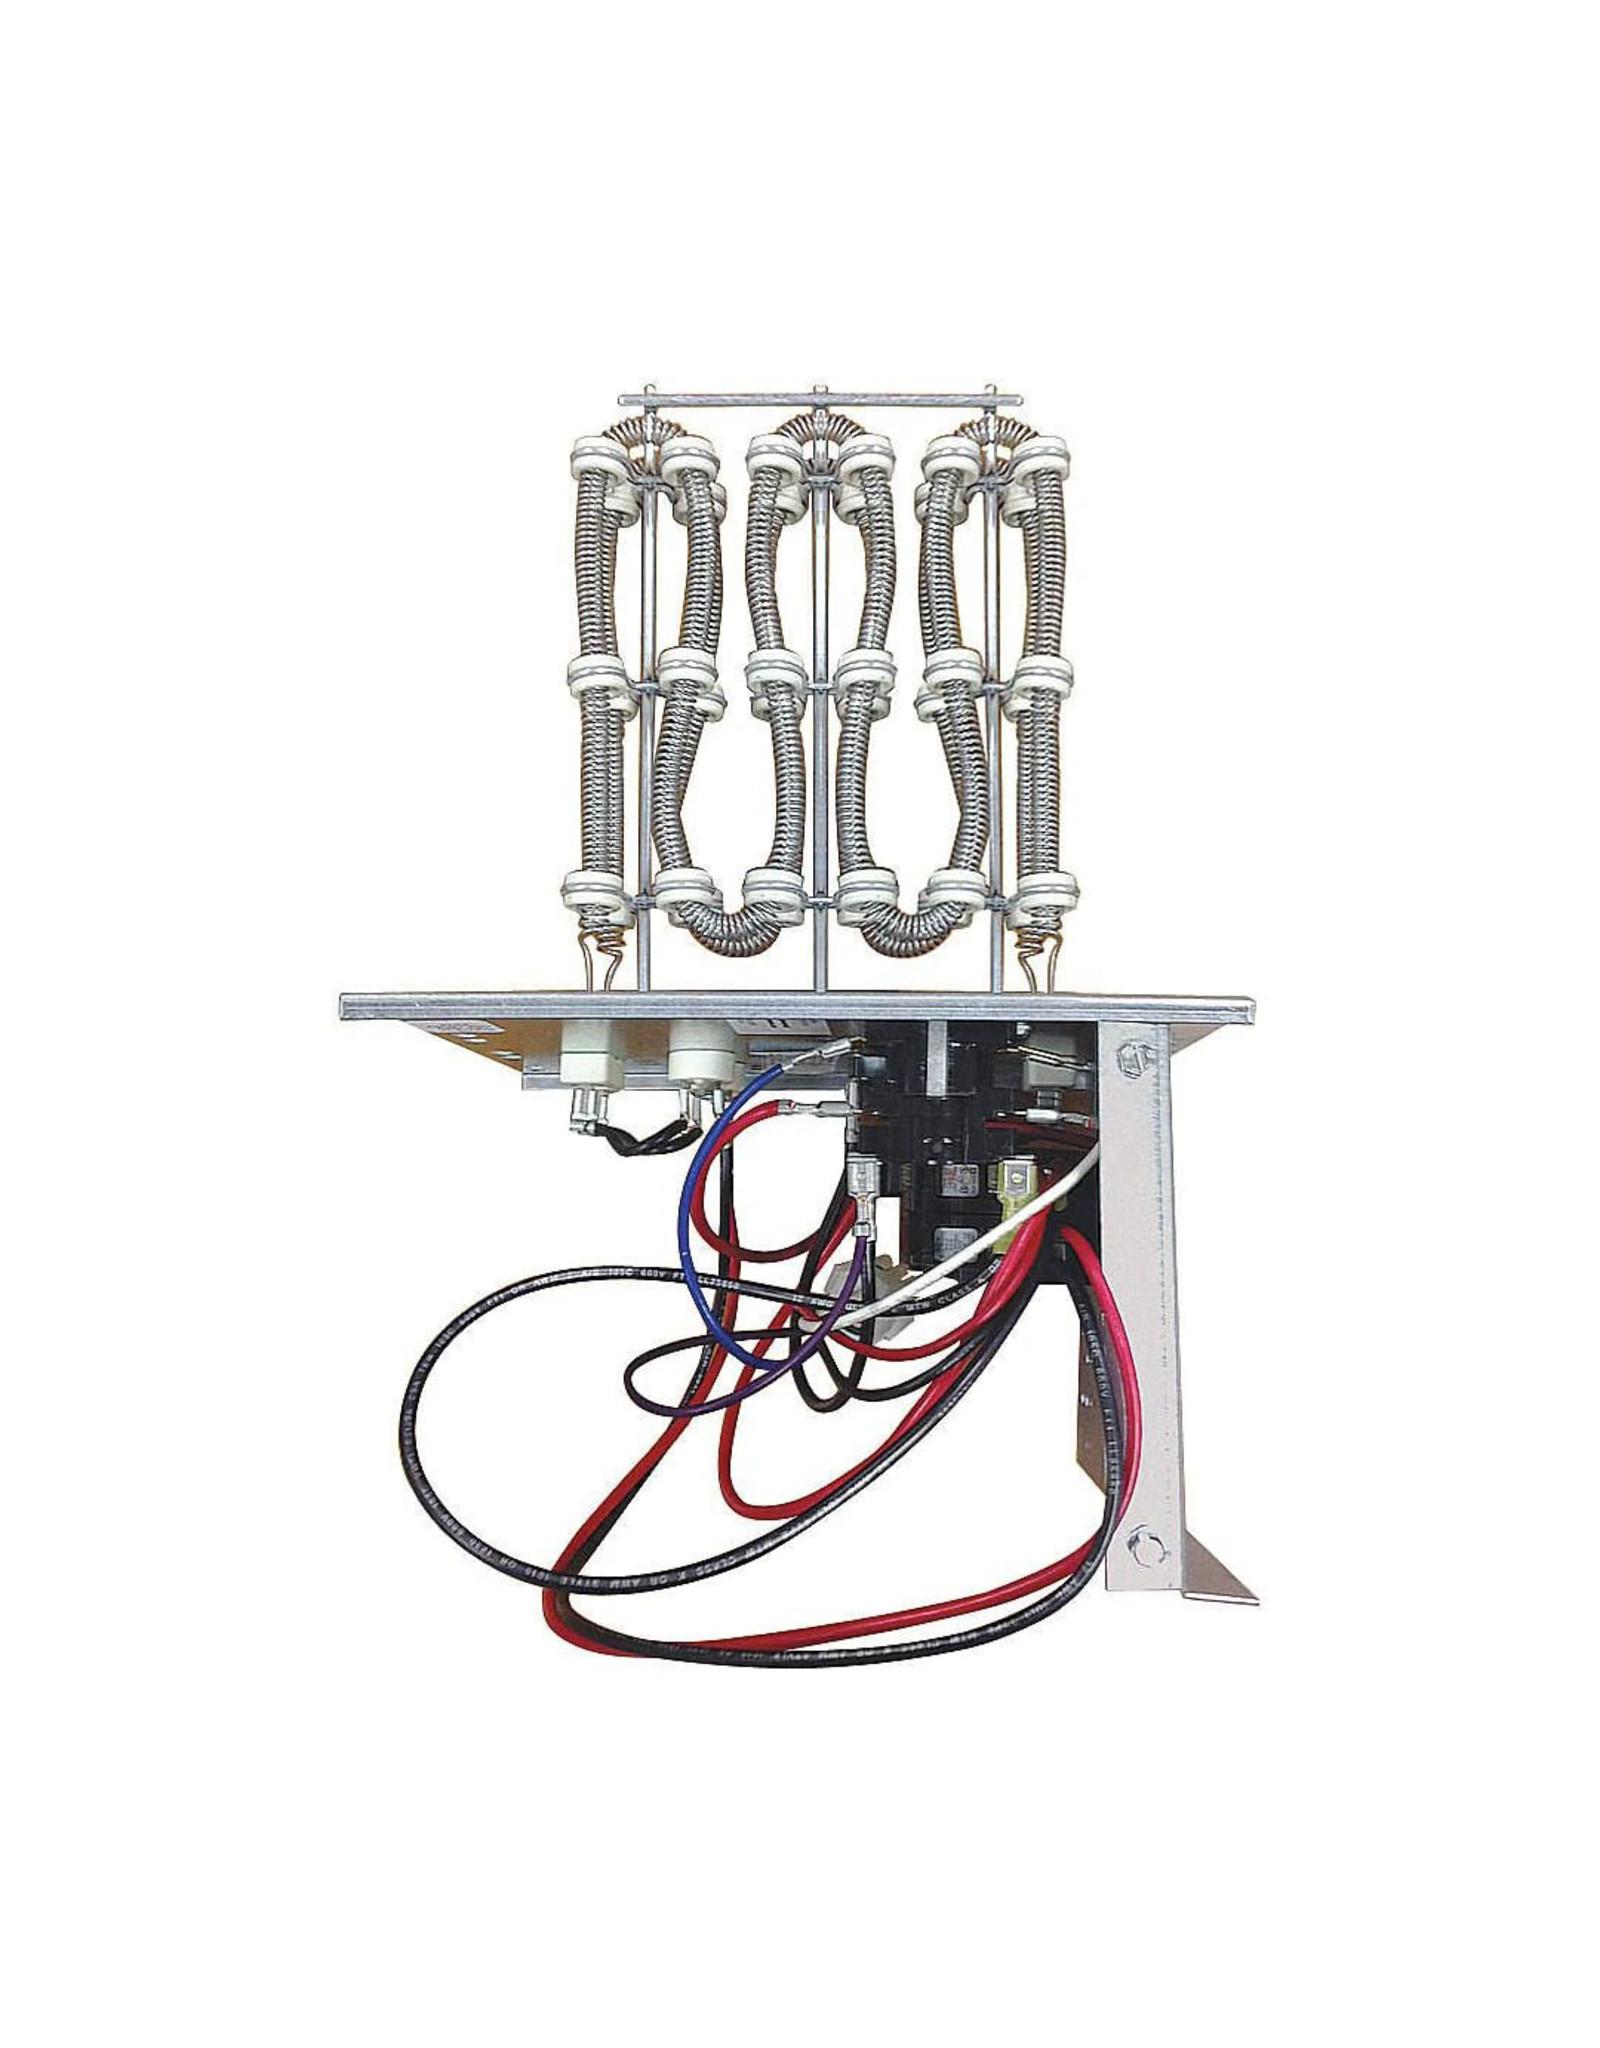 Goodman Electric Heater Kit for Smart Frame Air Handler